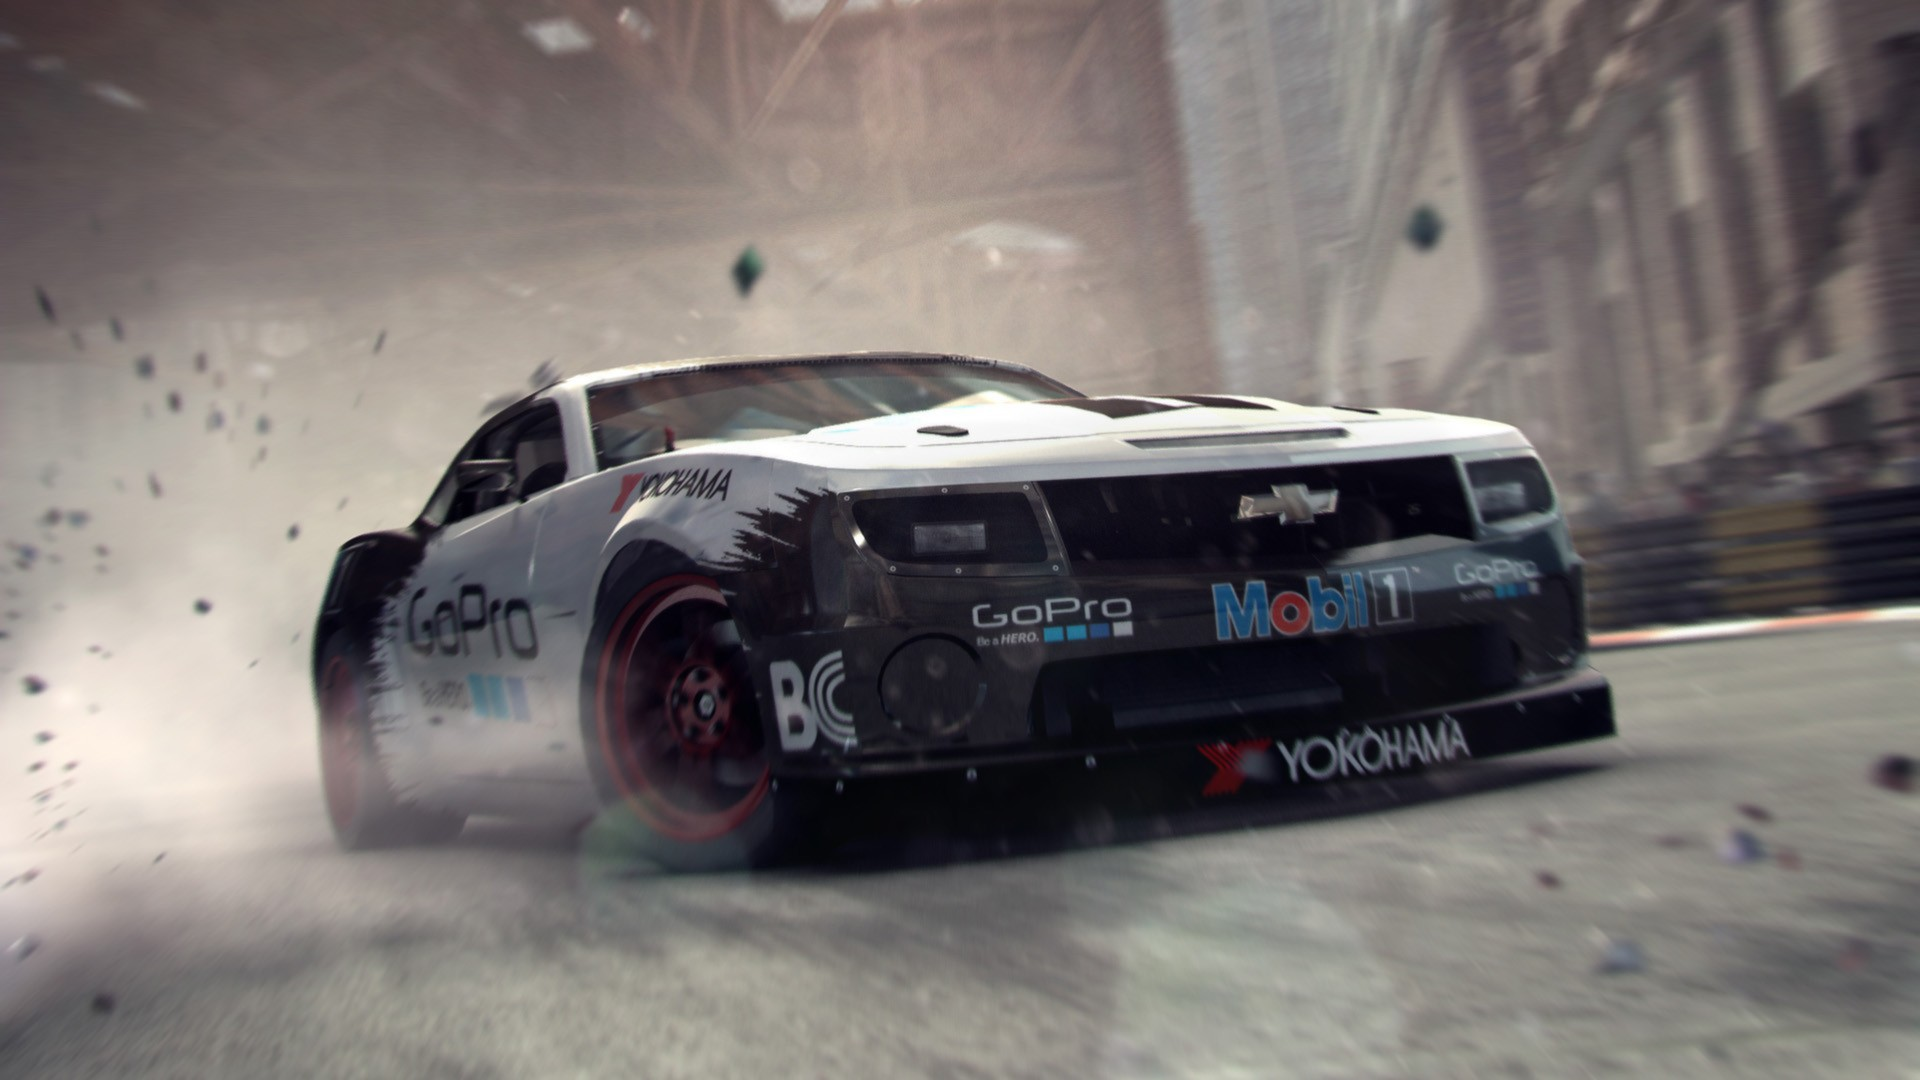 xbox 360 games kostenlos runterladen